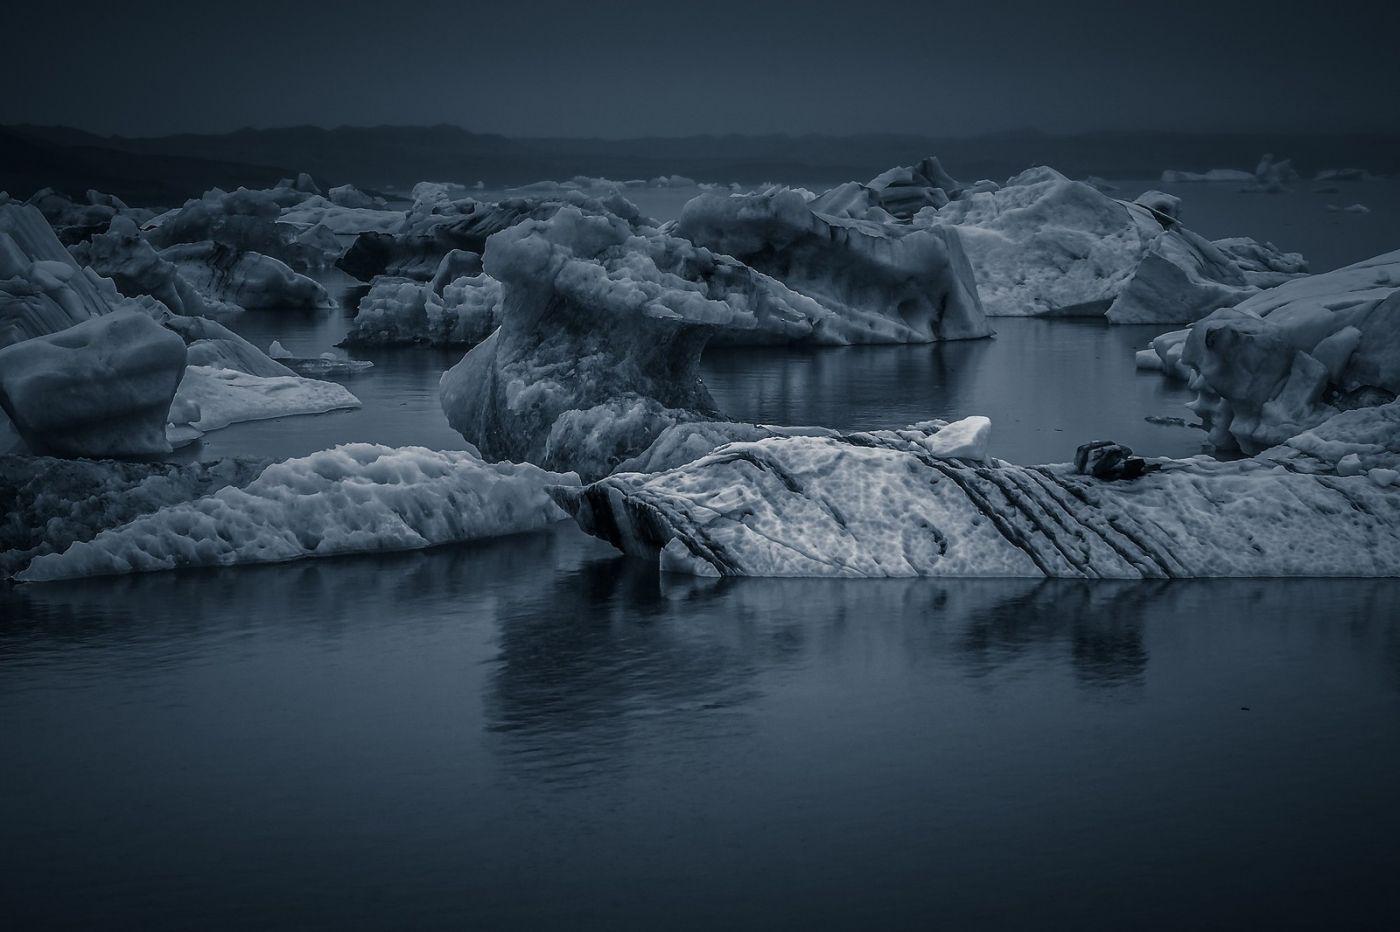 冰岛冰川泻湖(Glacier Lagoon),流动的冰川_图1-28